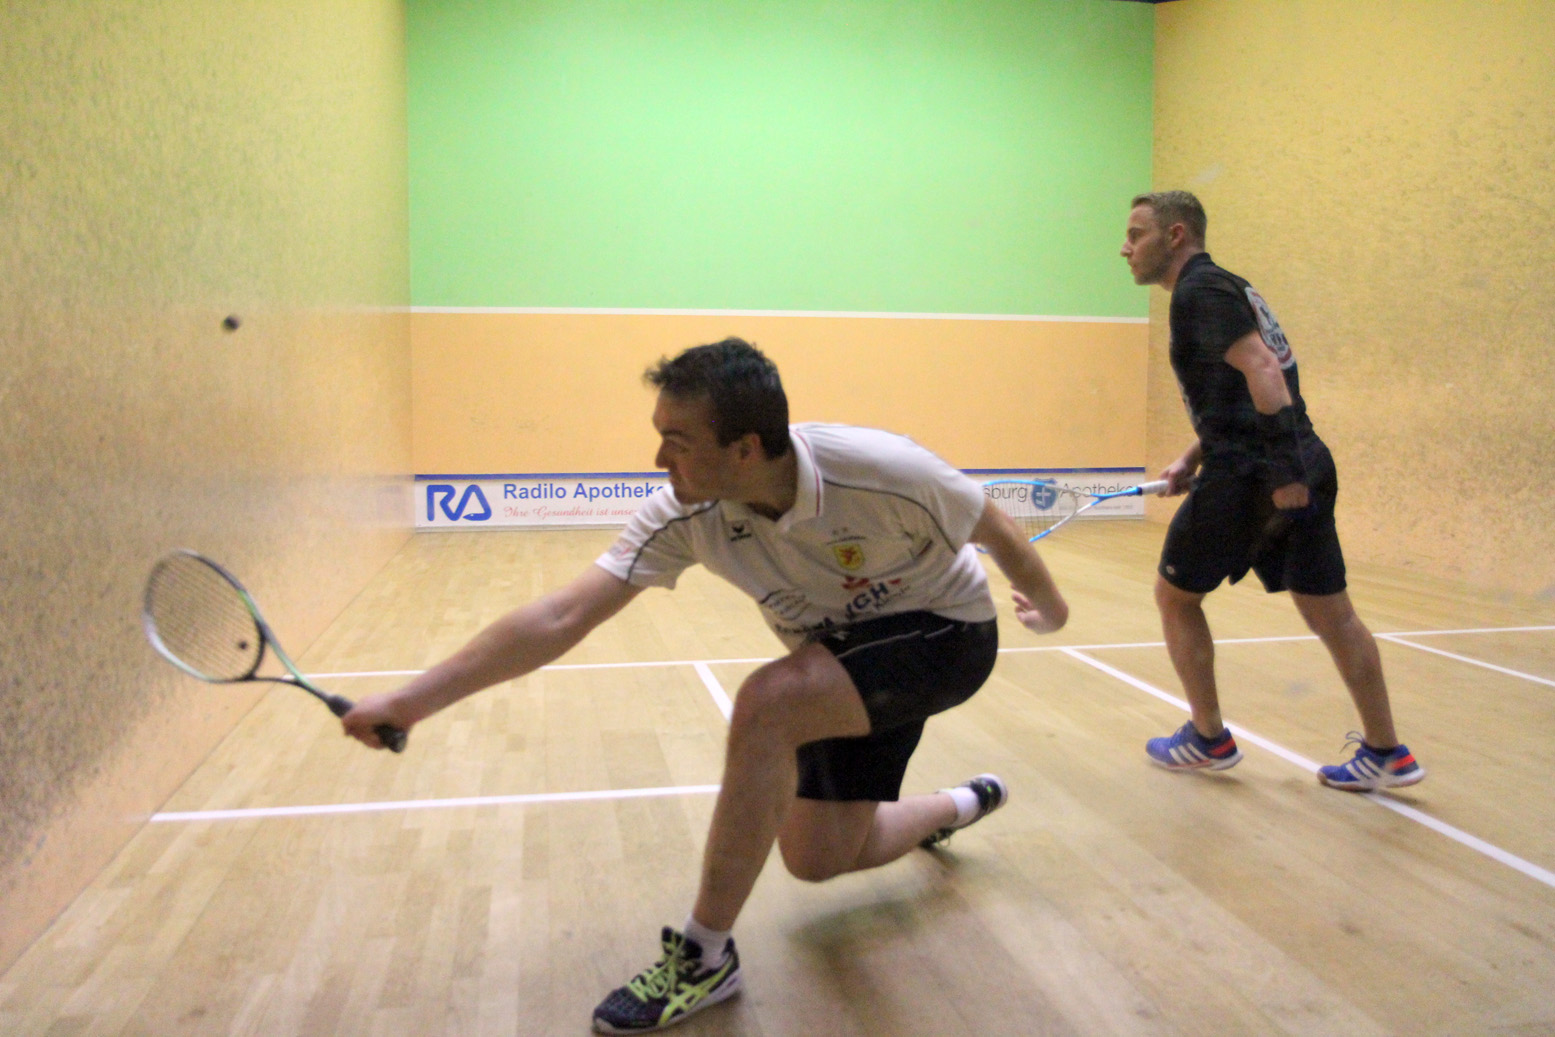 2015-04-18 Squash BL Playoffs Frankfurt 142.jpg